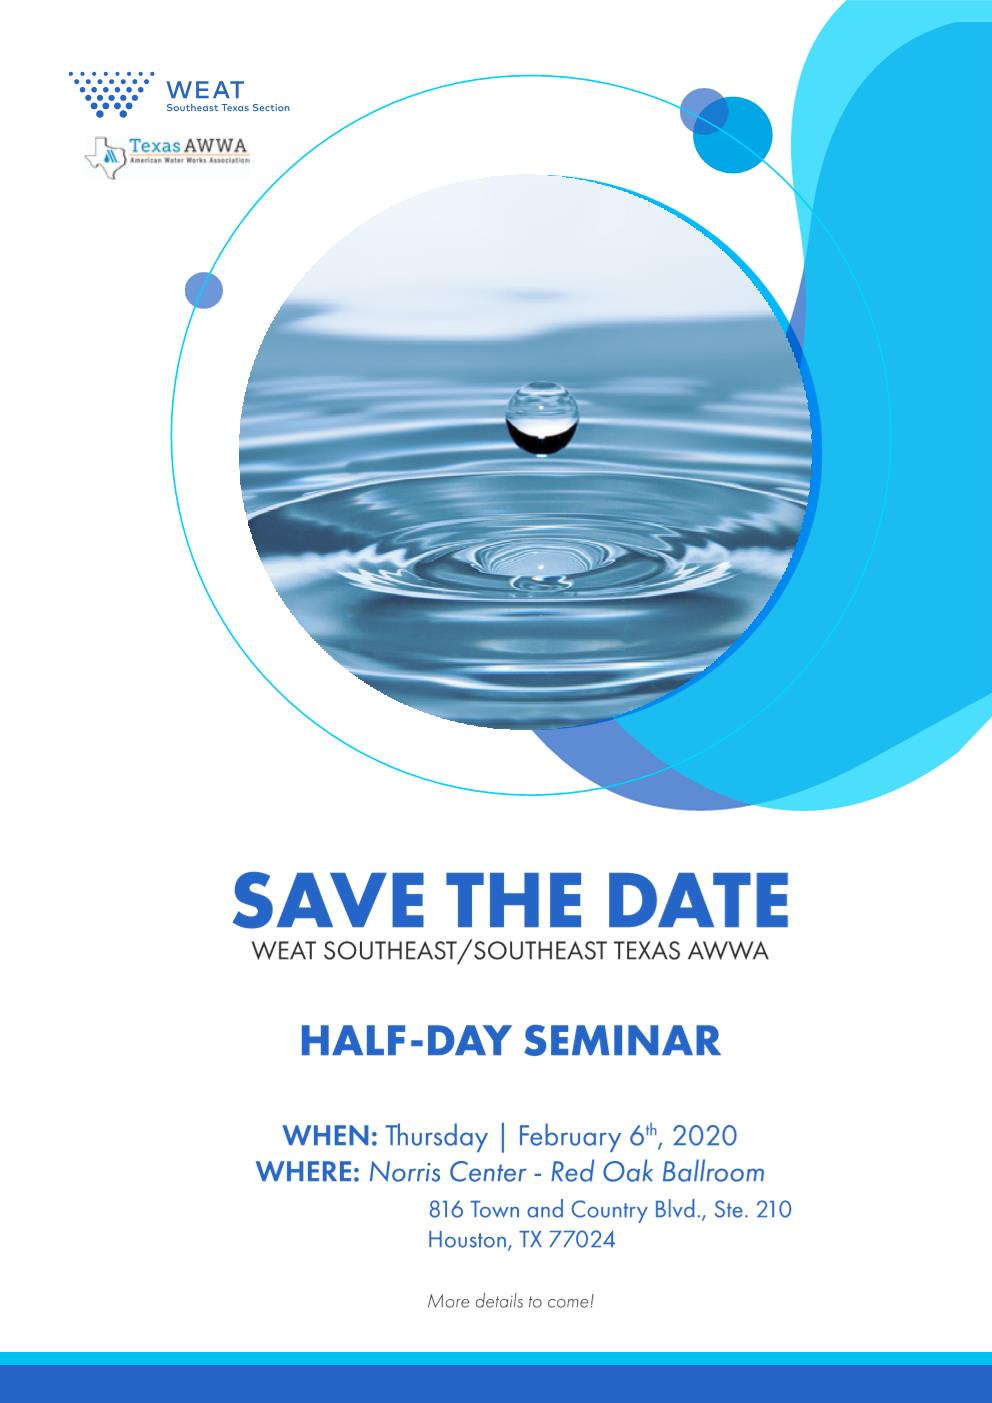 WEAT/TAWWA Half-Day Seminar